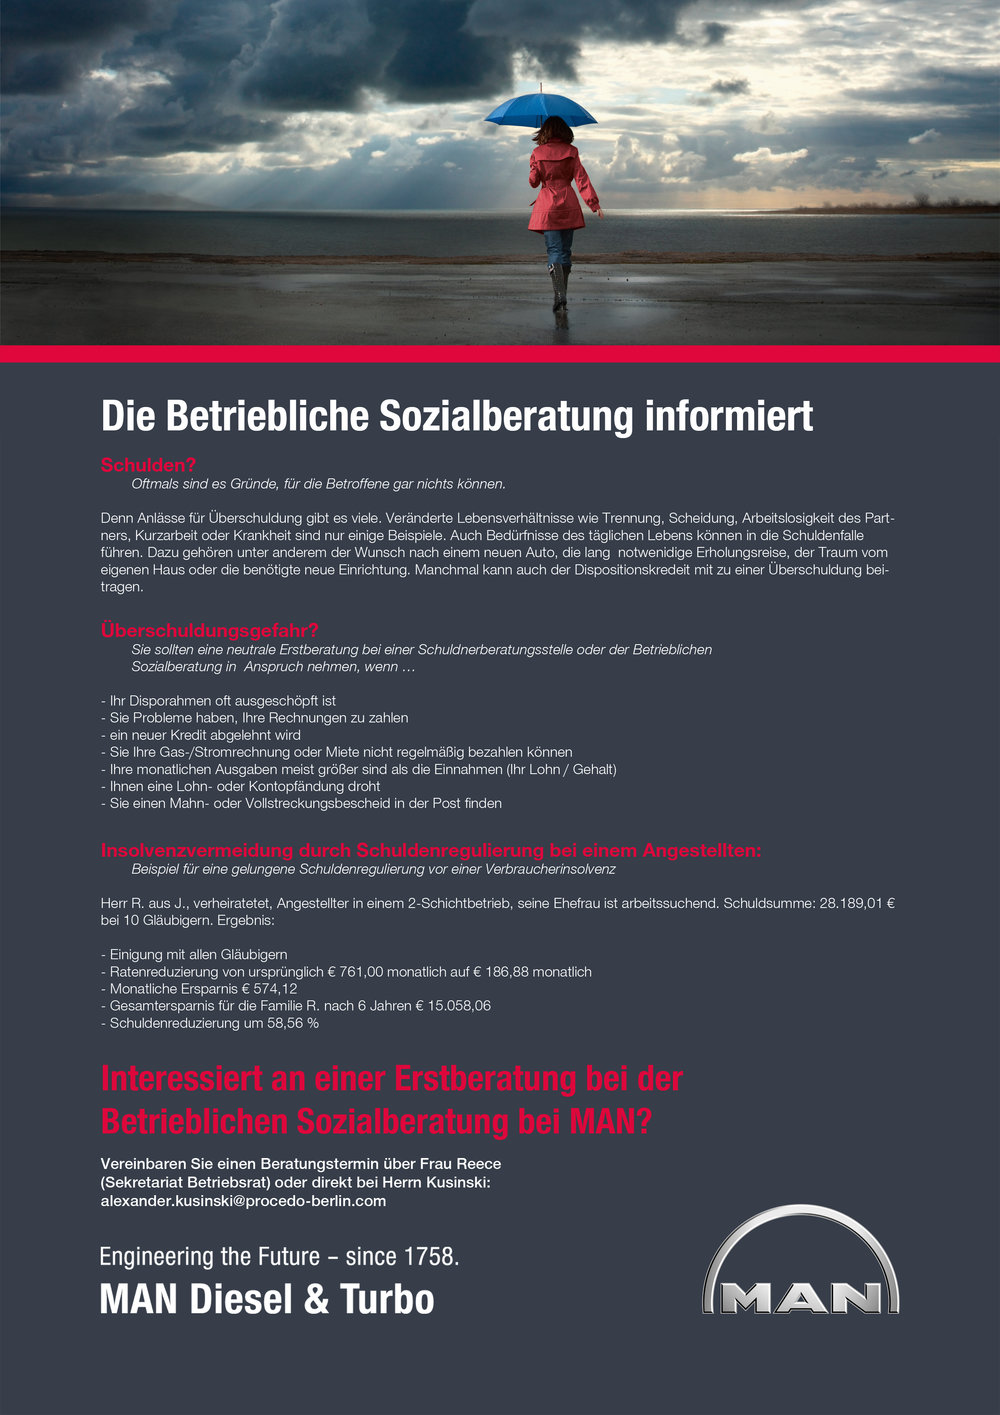 A4_Schulden_Betriebliche_Sozialberatung.jpg